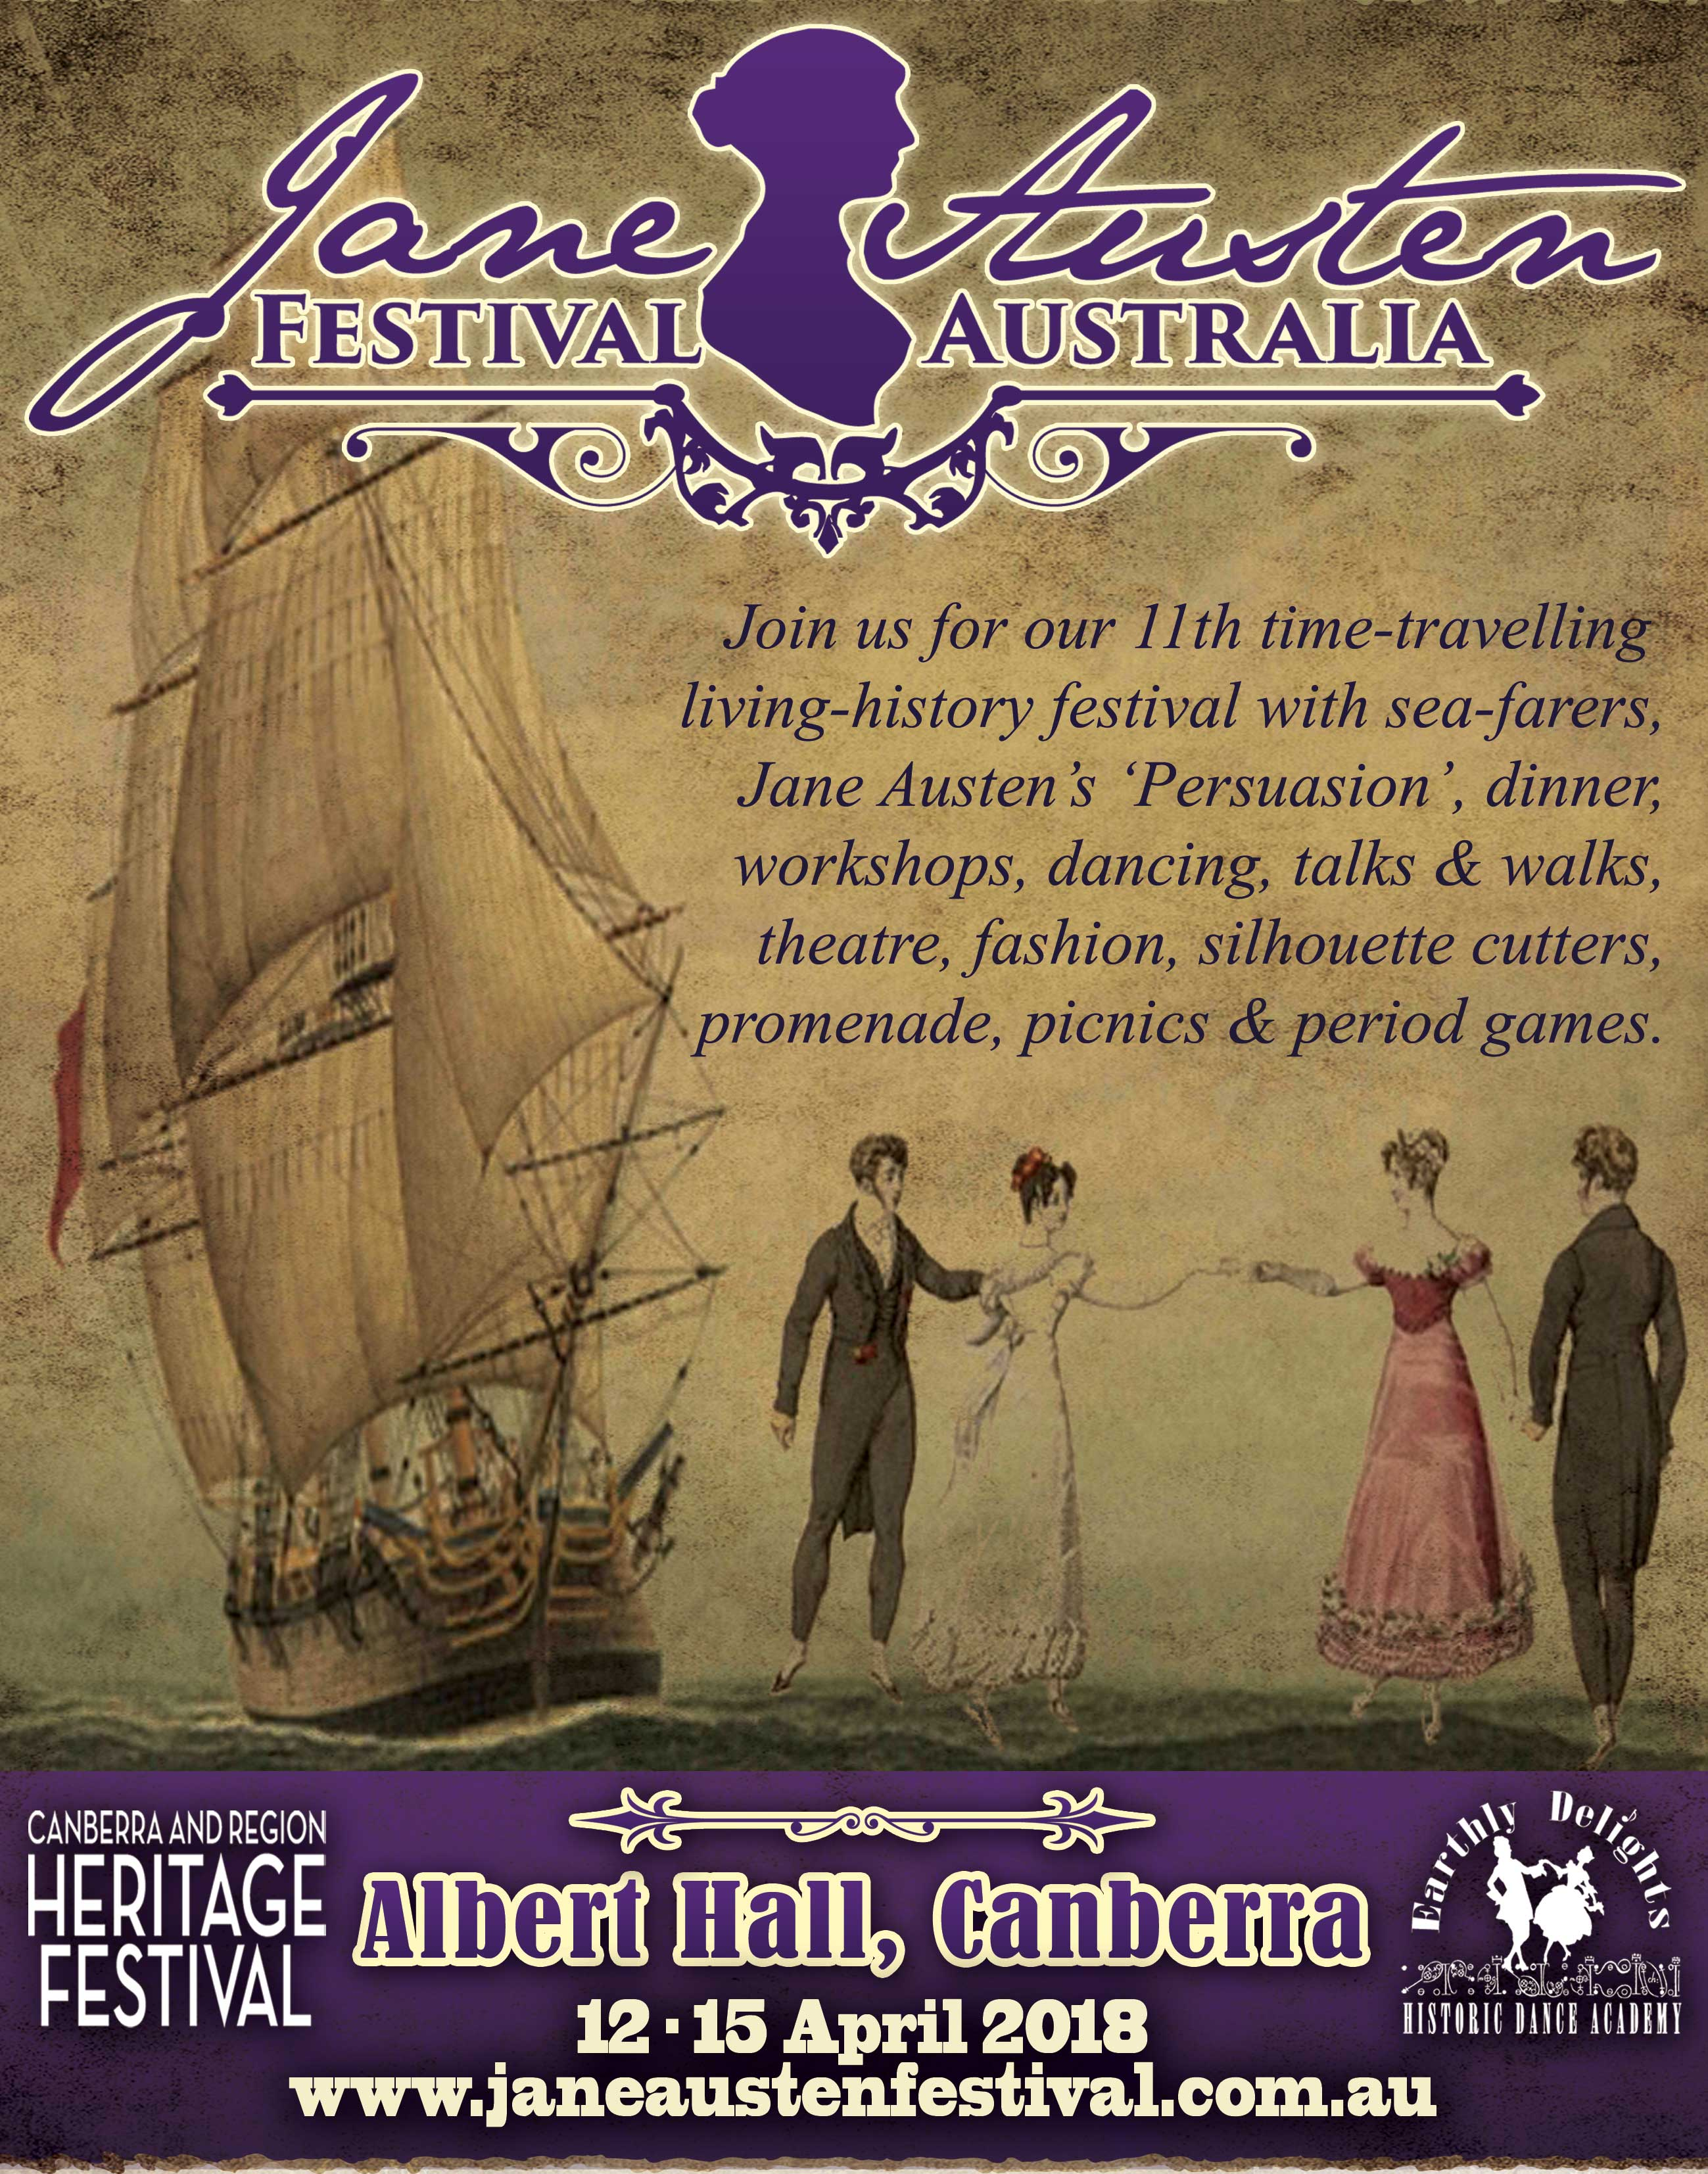 Jane Austen Festival Australia 2018